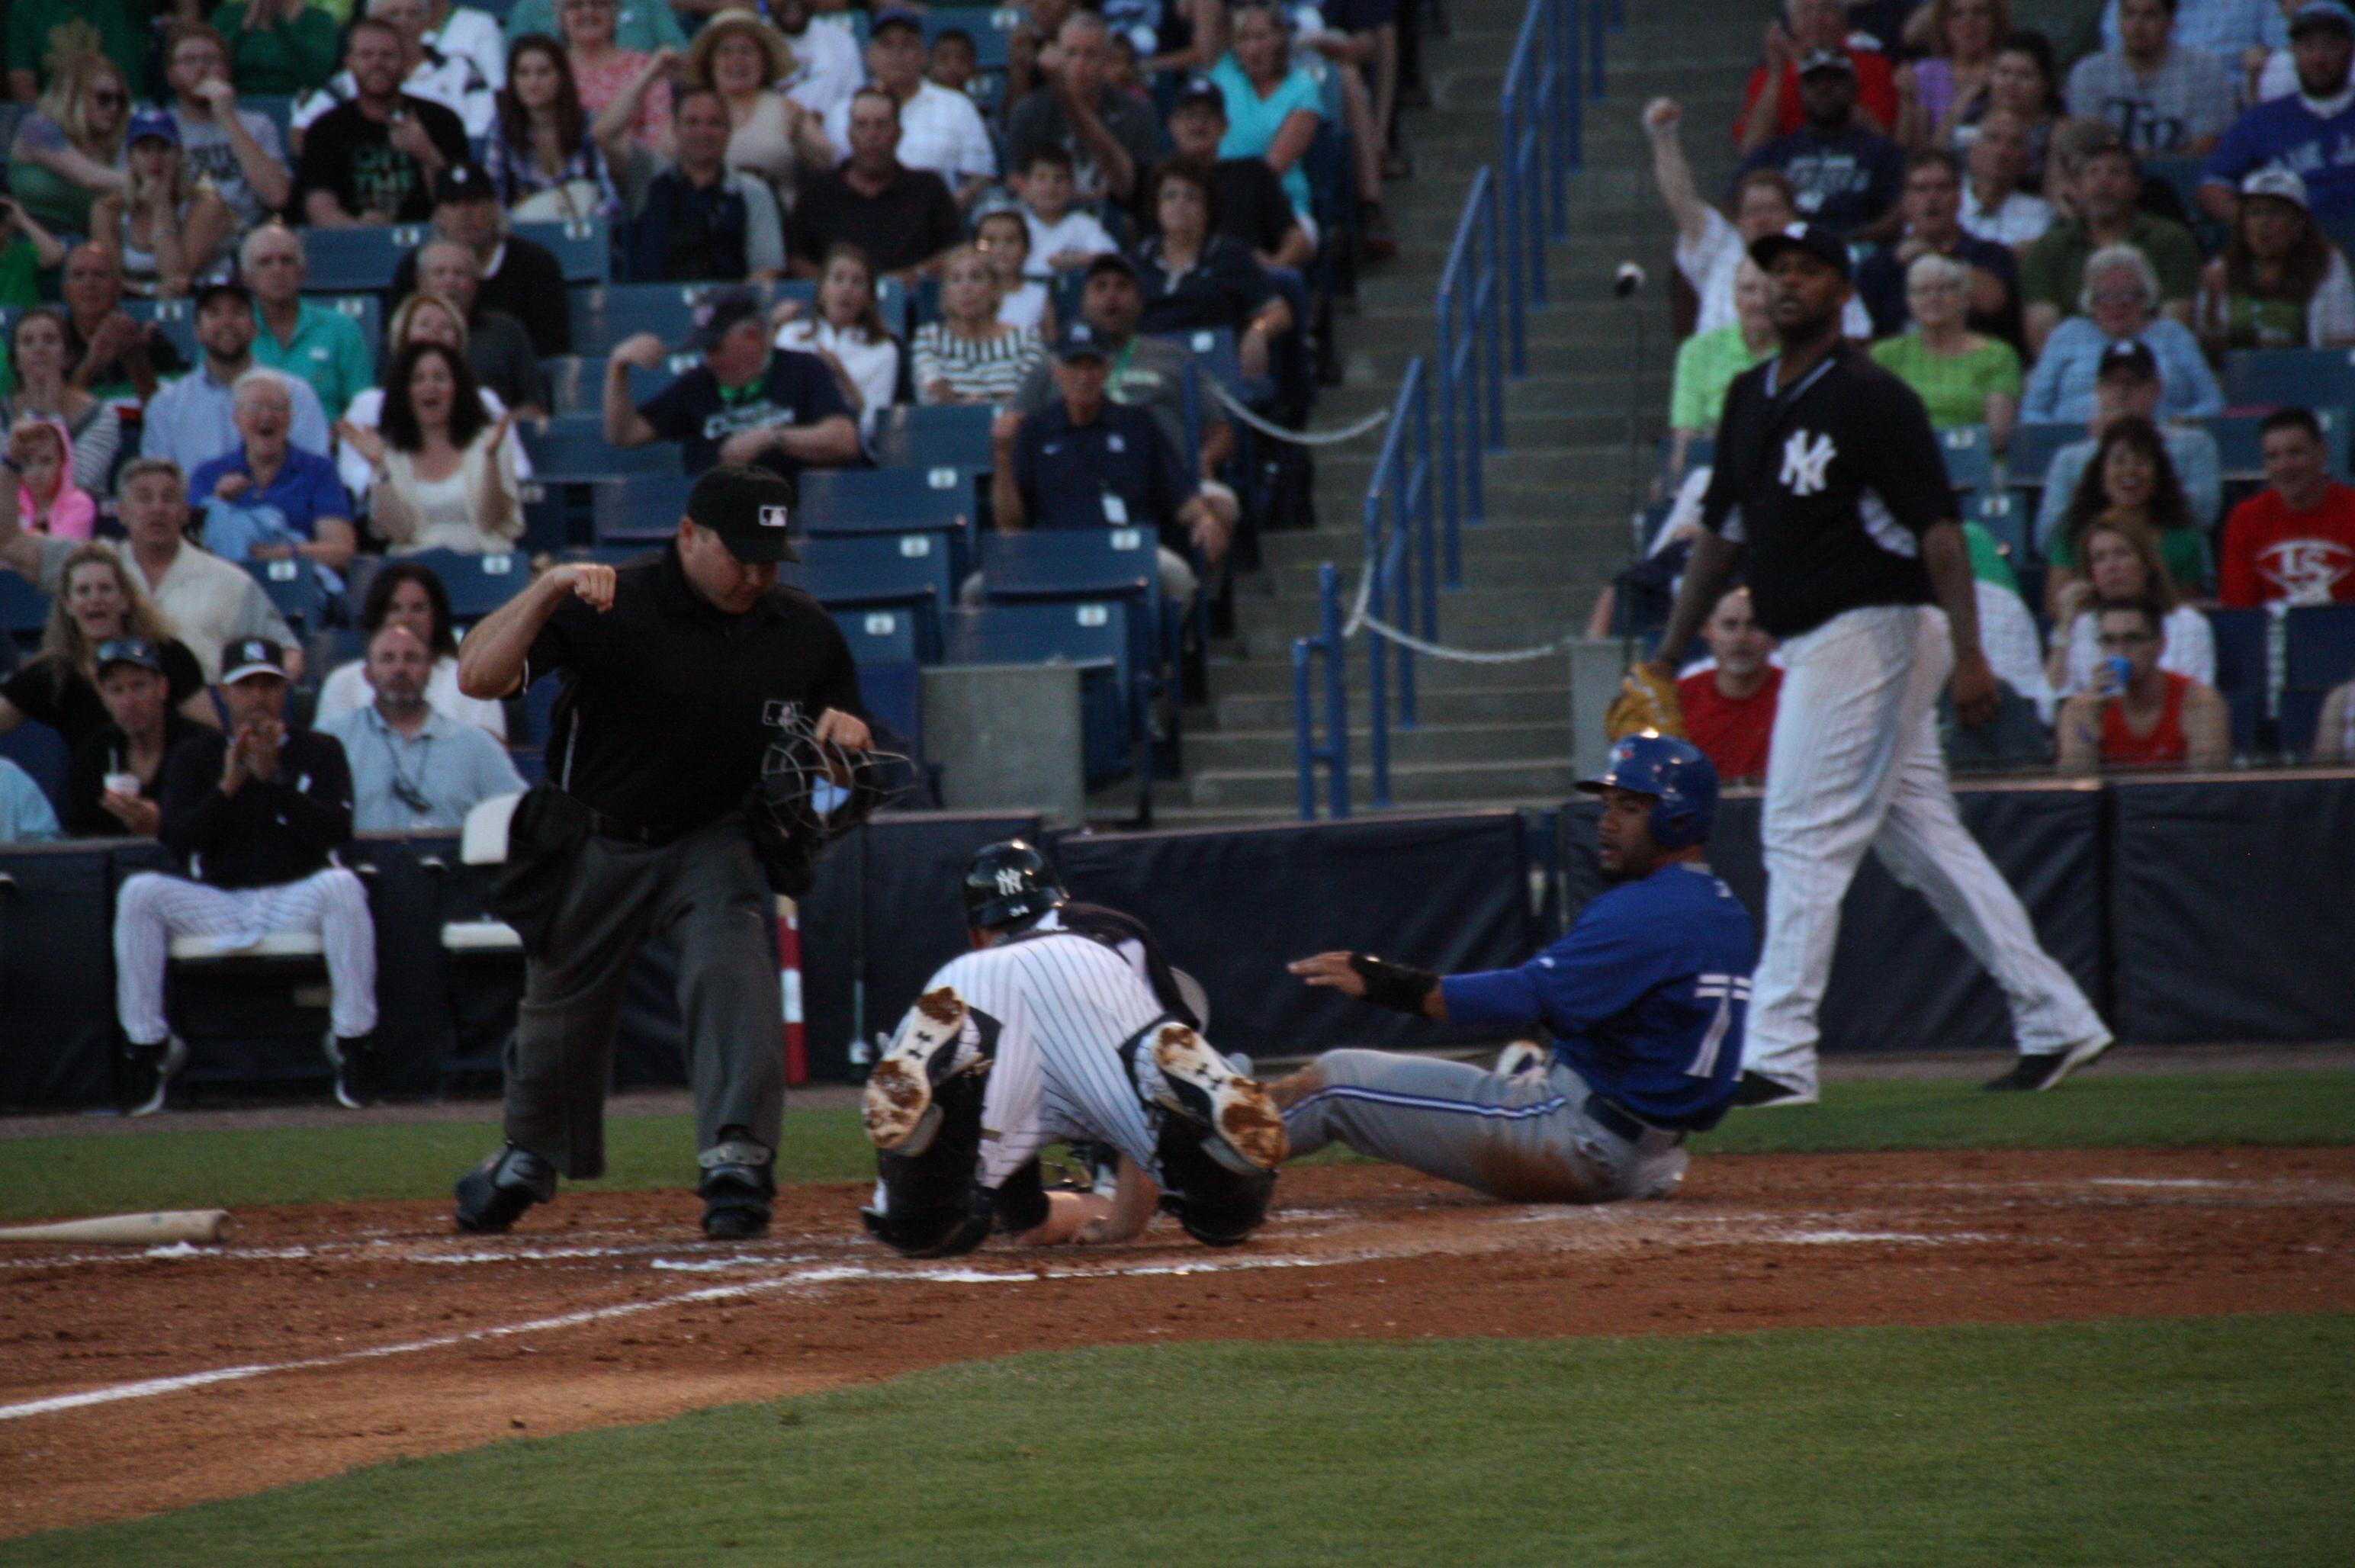 Blue Jays Devon Travis was gunned down at home by  Yankee shortstop Di Di Gregorius. (EDDIE MICHELS PHOTO)